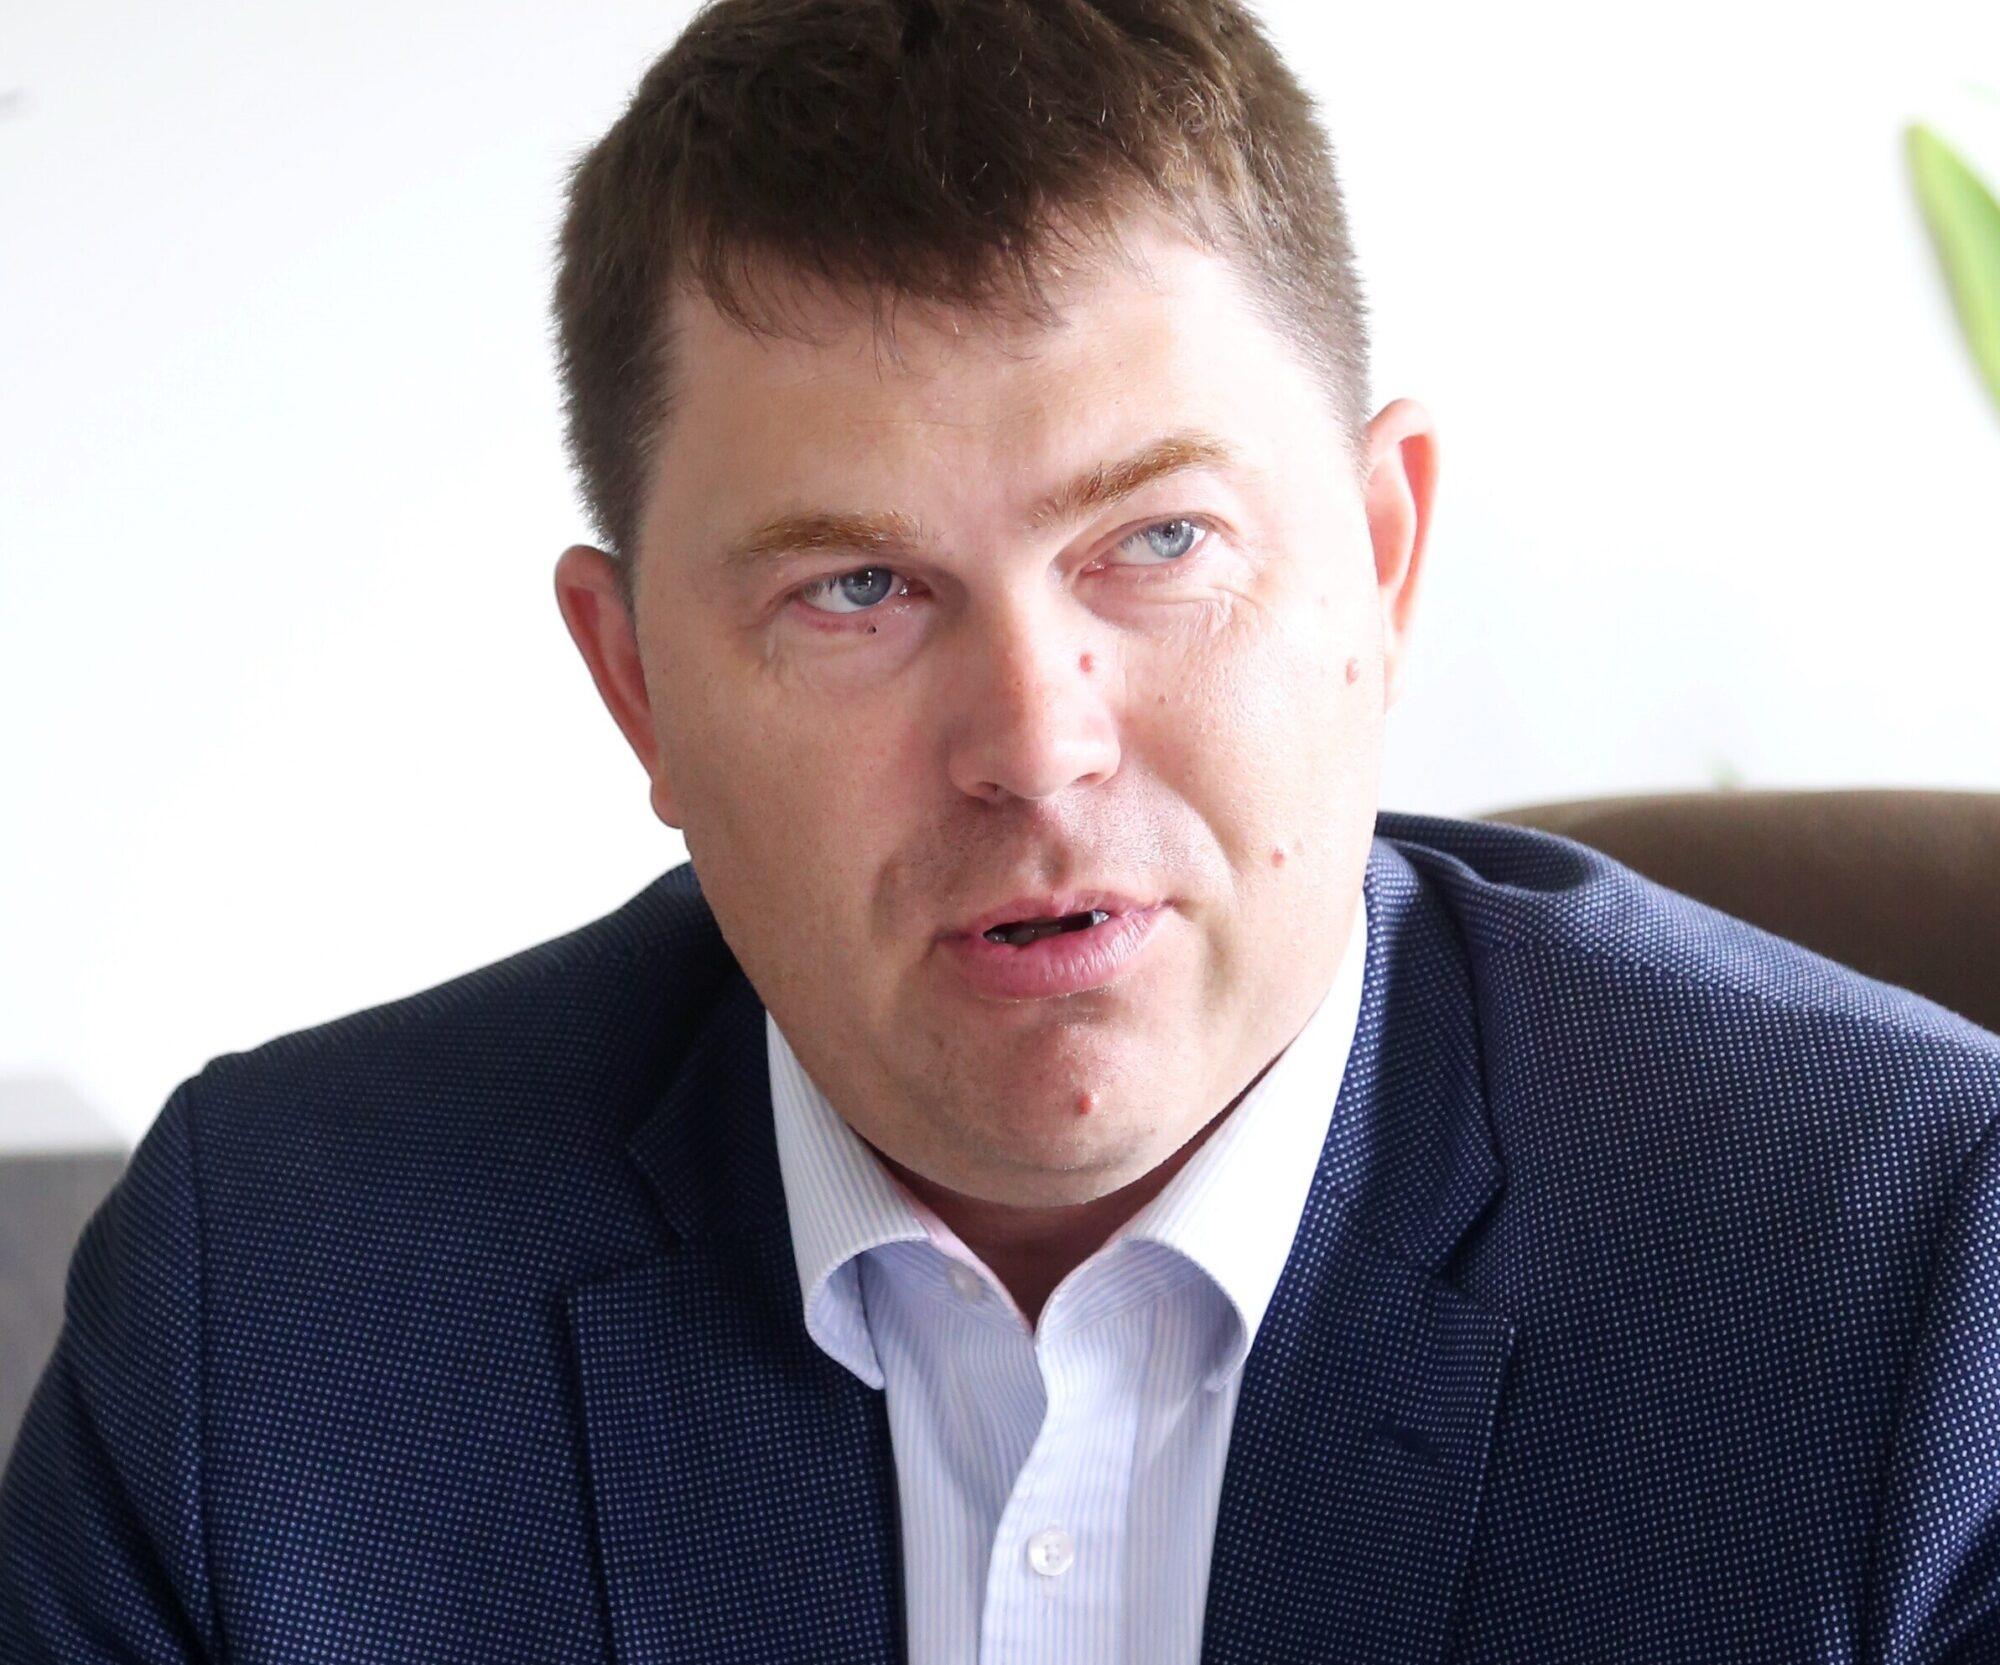 Uģis Muskovs